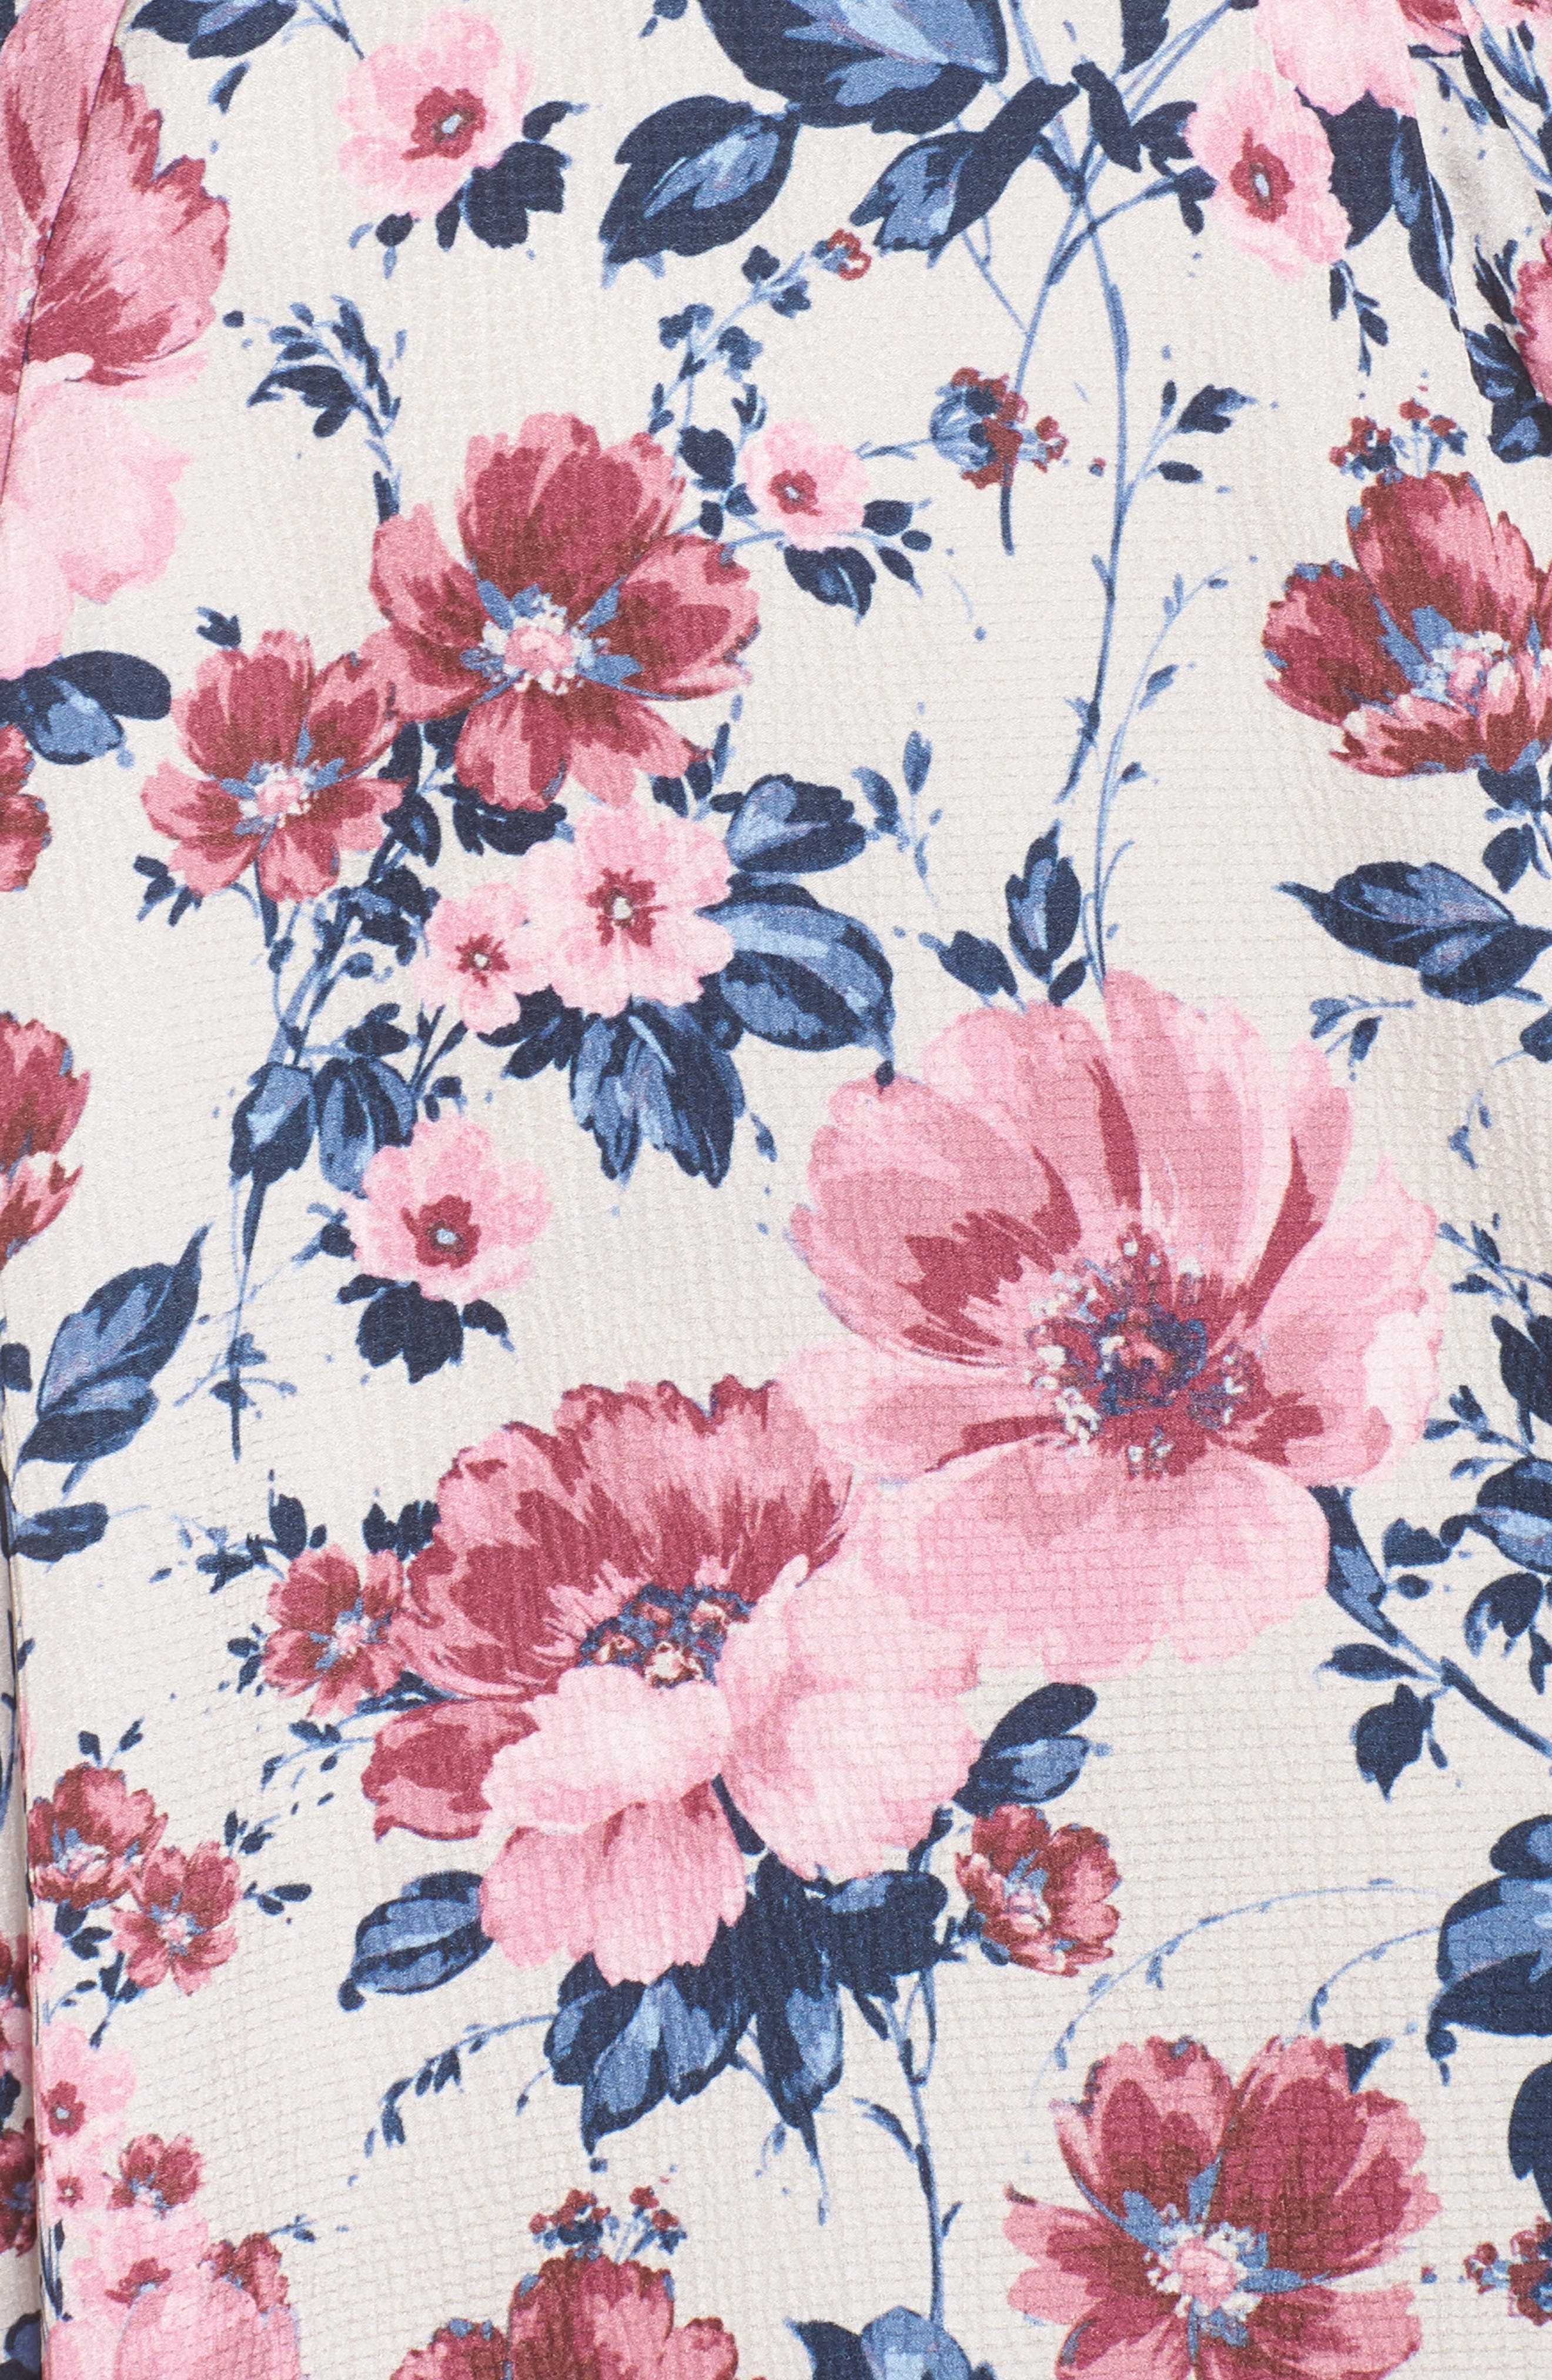 Julia Seersucker Midi Dress,                             Alternate thumbnail 7, color,                             Beige/ Pink